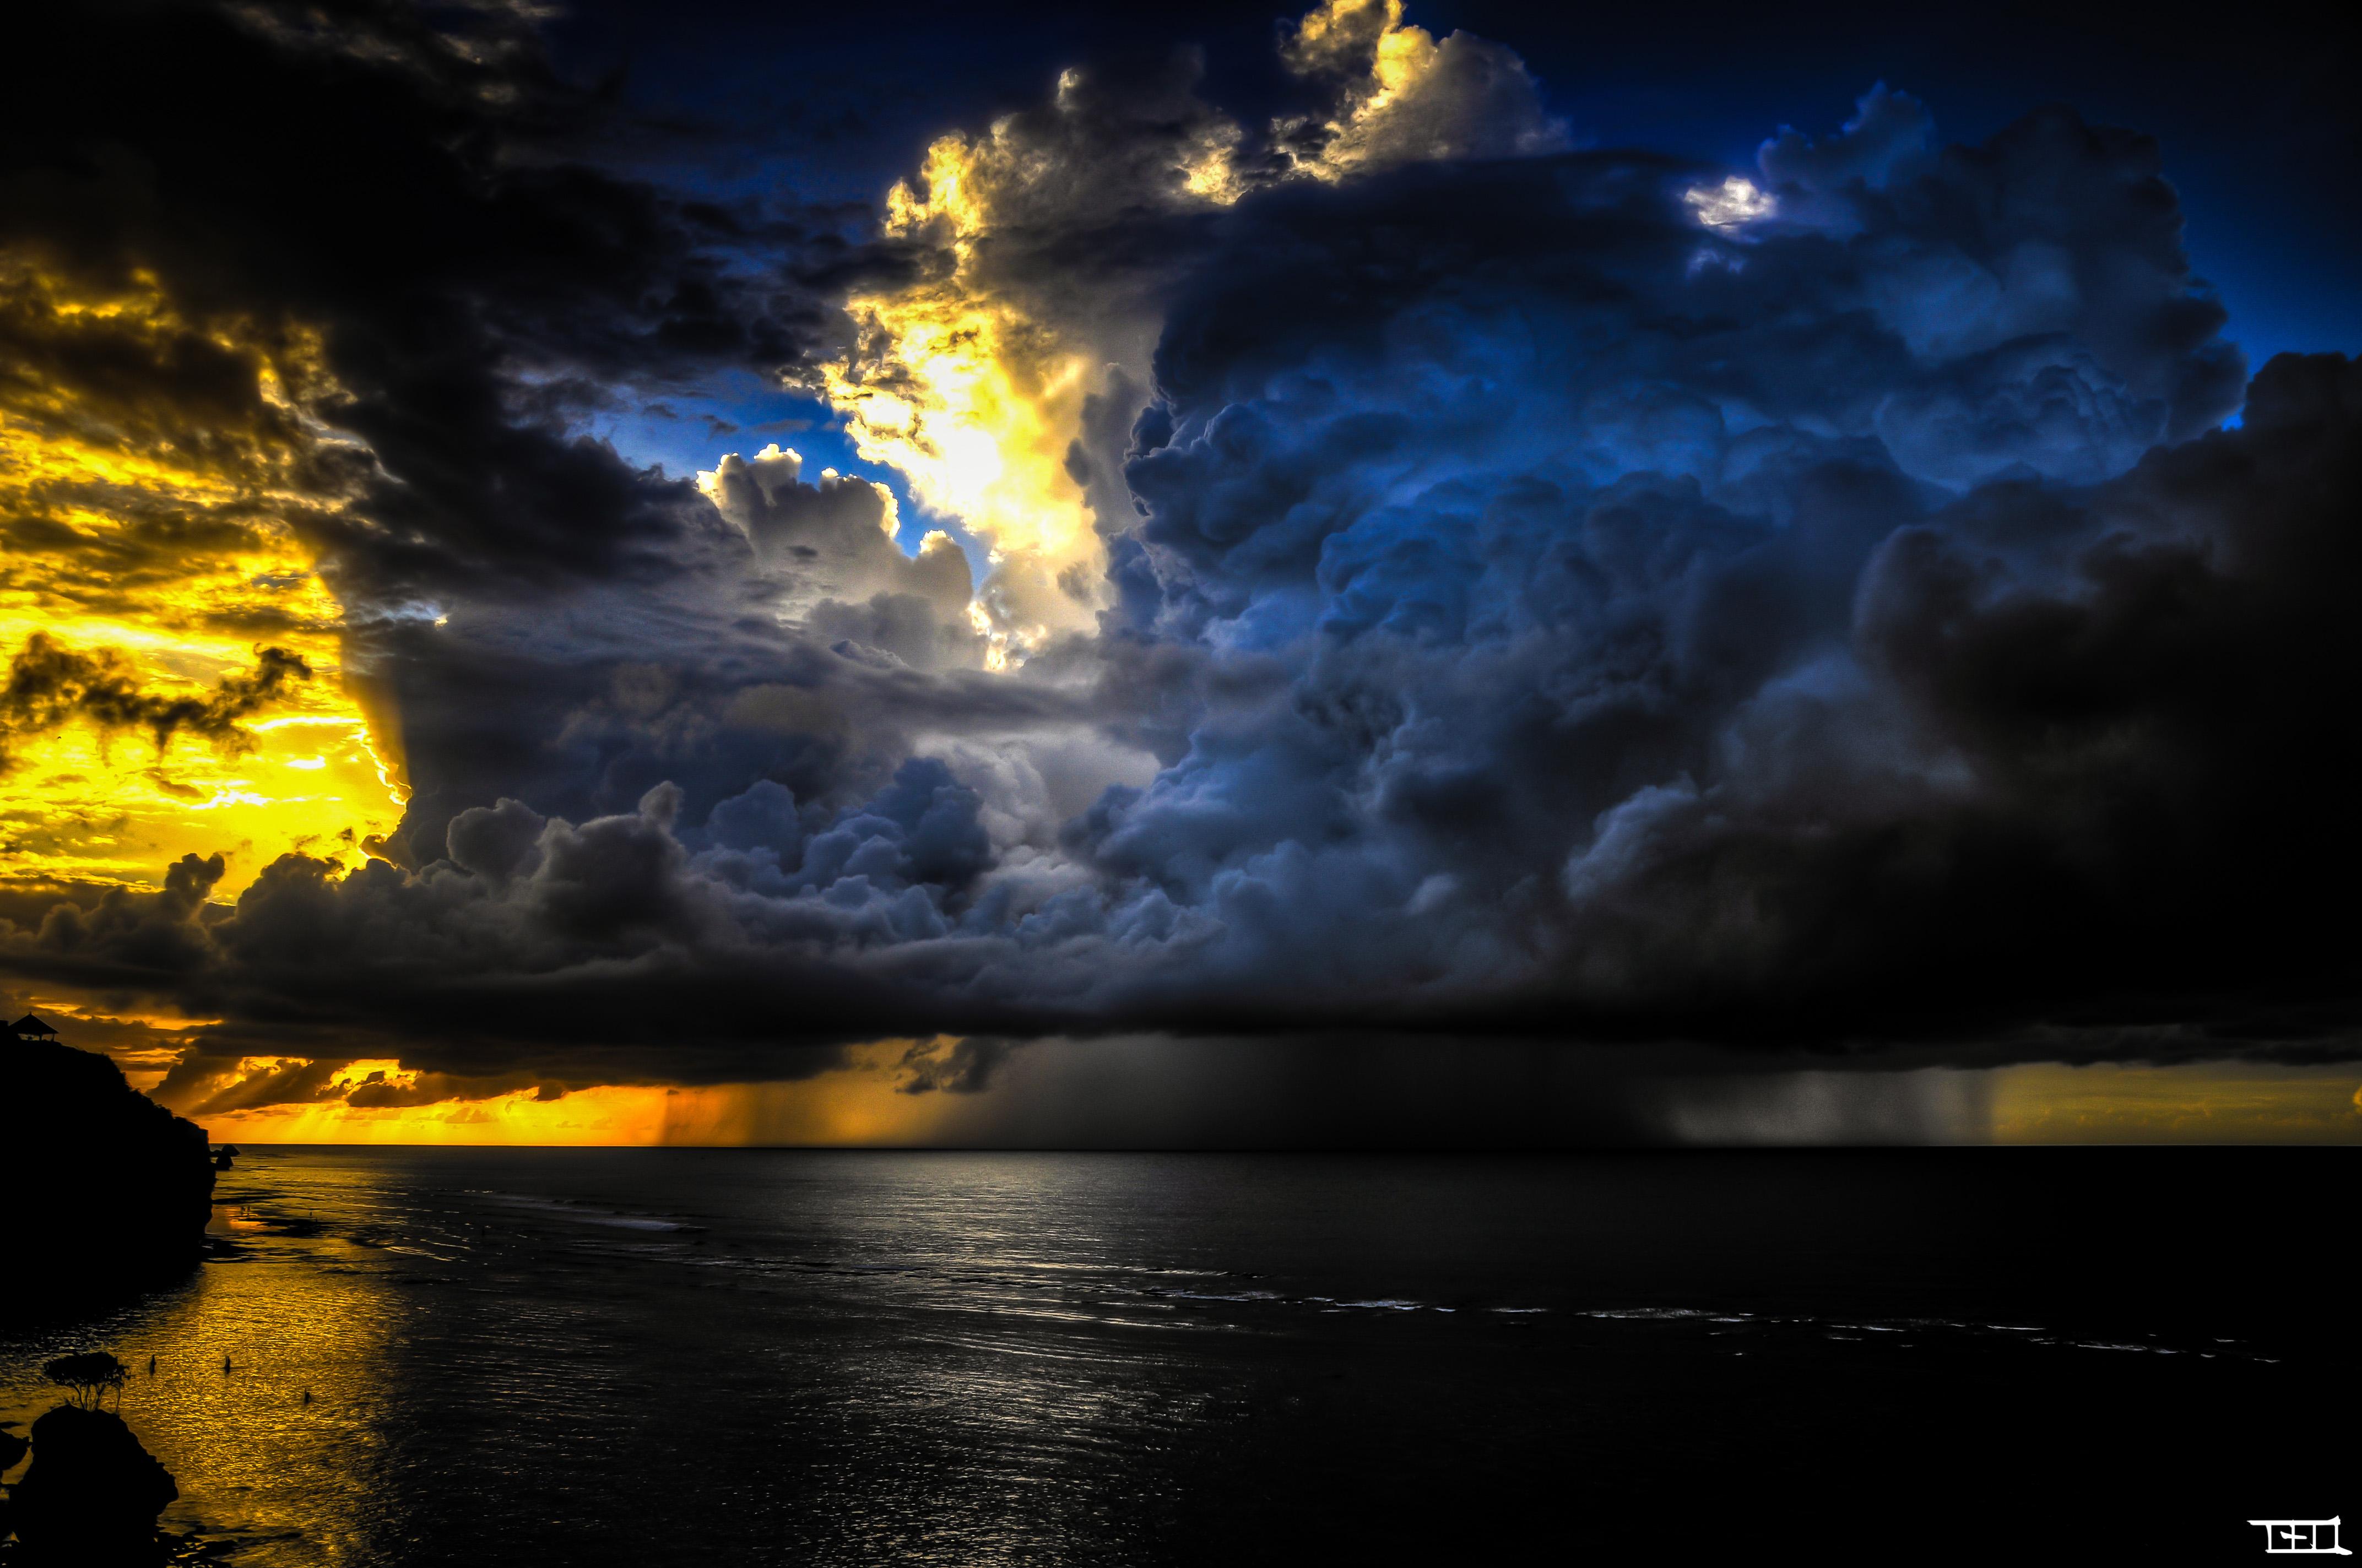 море перед бурей  № 3112511 бесплатно